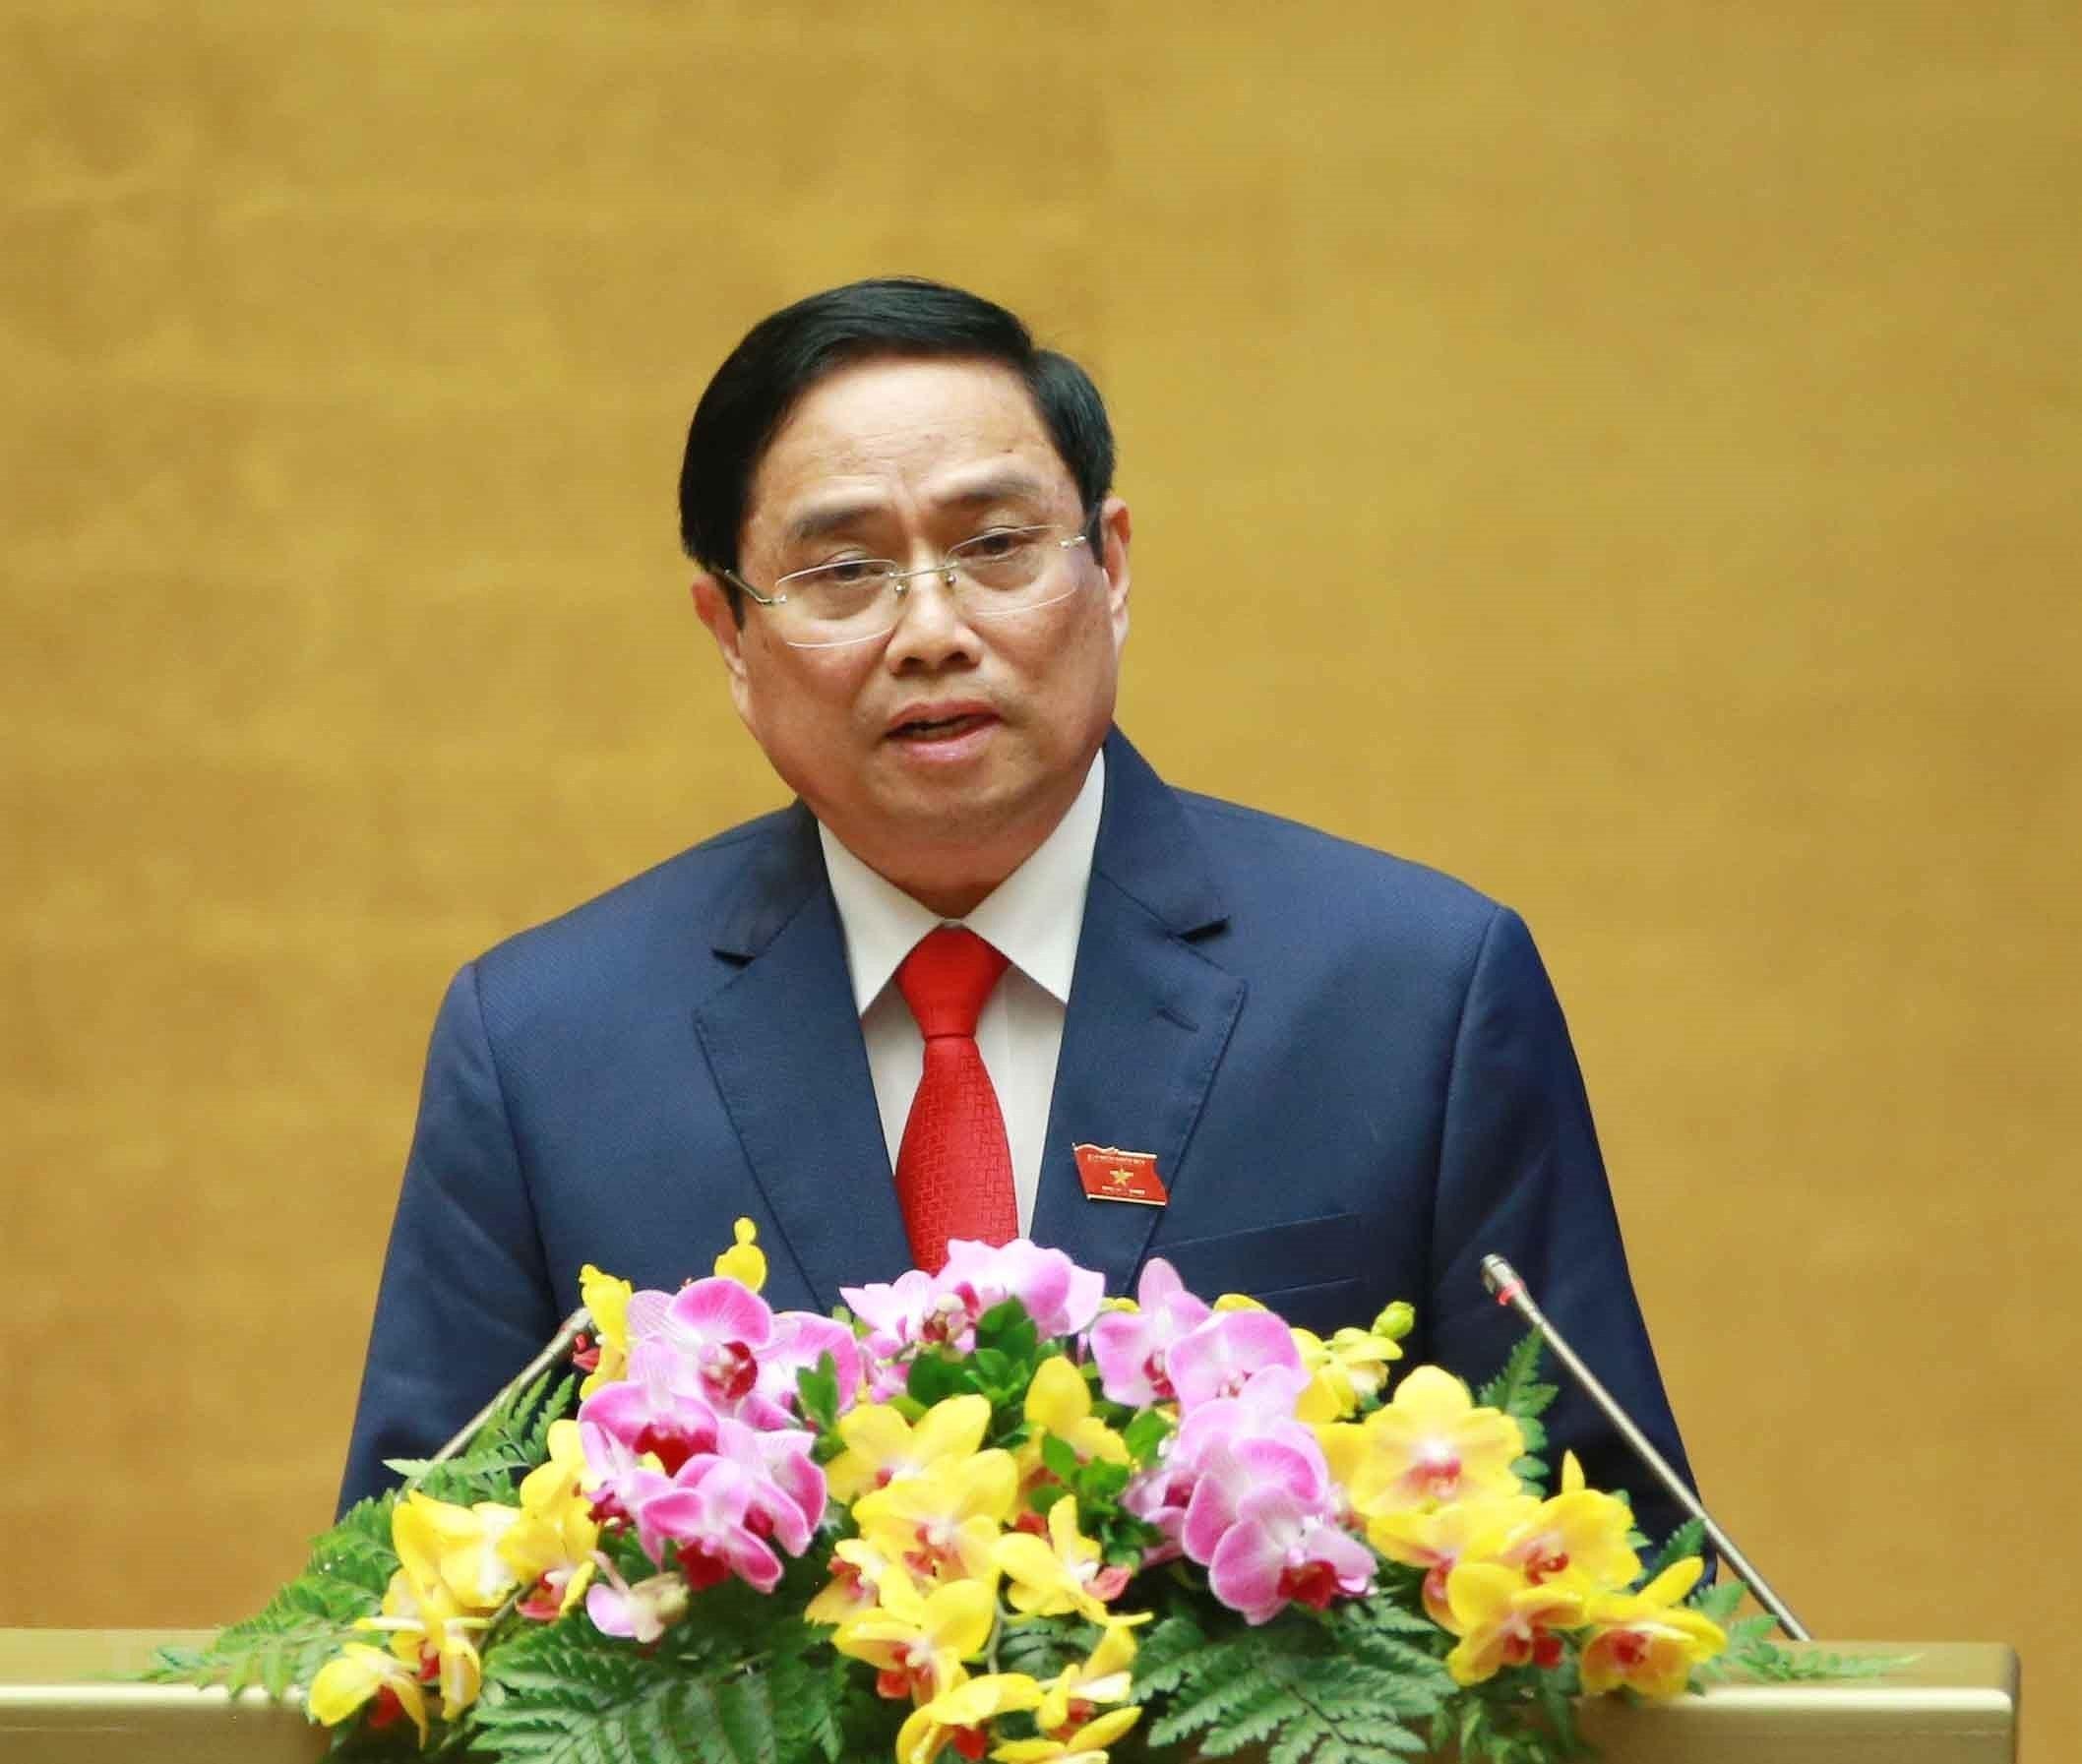 Tan Thu tuong Pham Minh Chinh: No luc doan ket, hanh dong hieu qua hinh anh 1